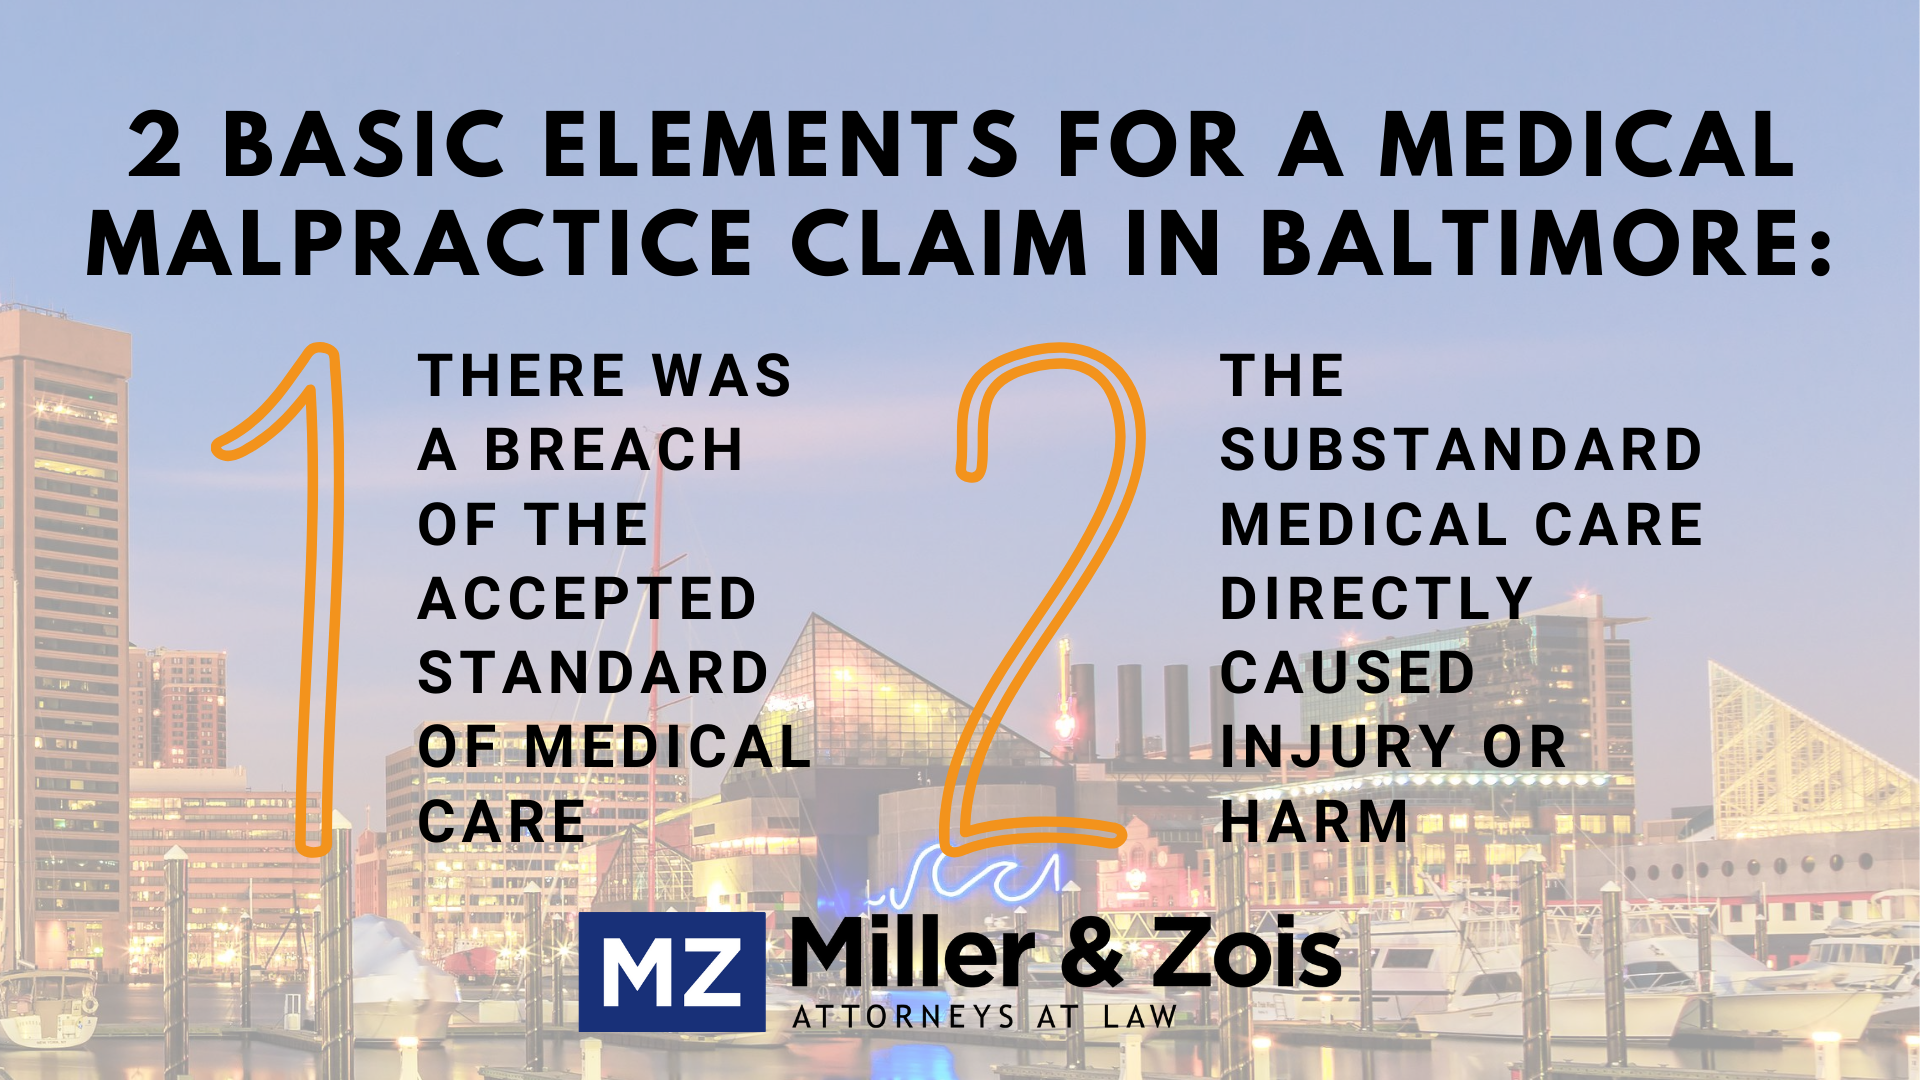 Baltimore medical malpractice